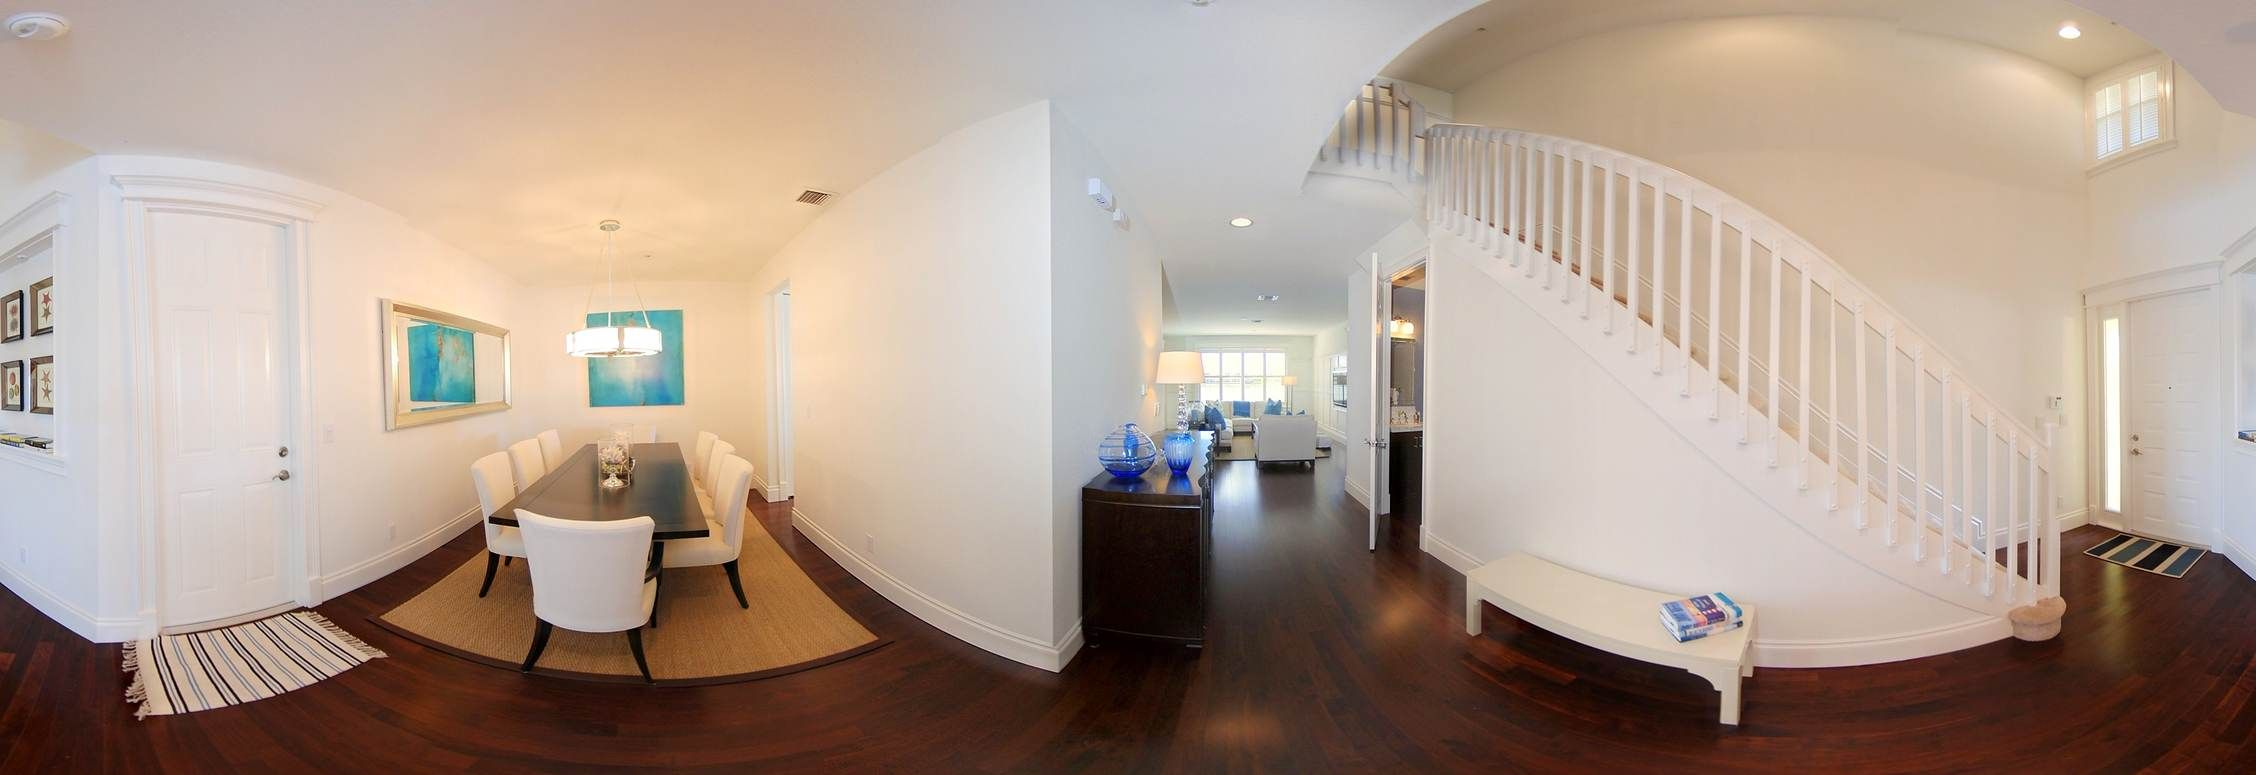 Foyer and Dinnnig Room